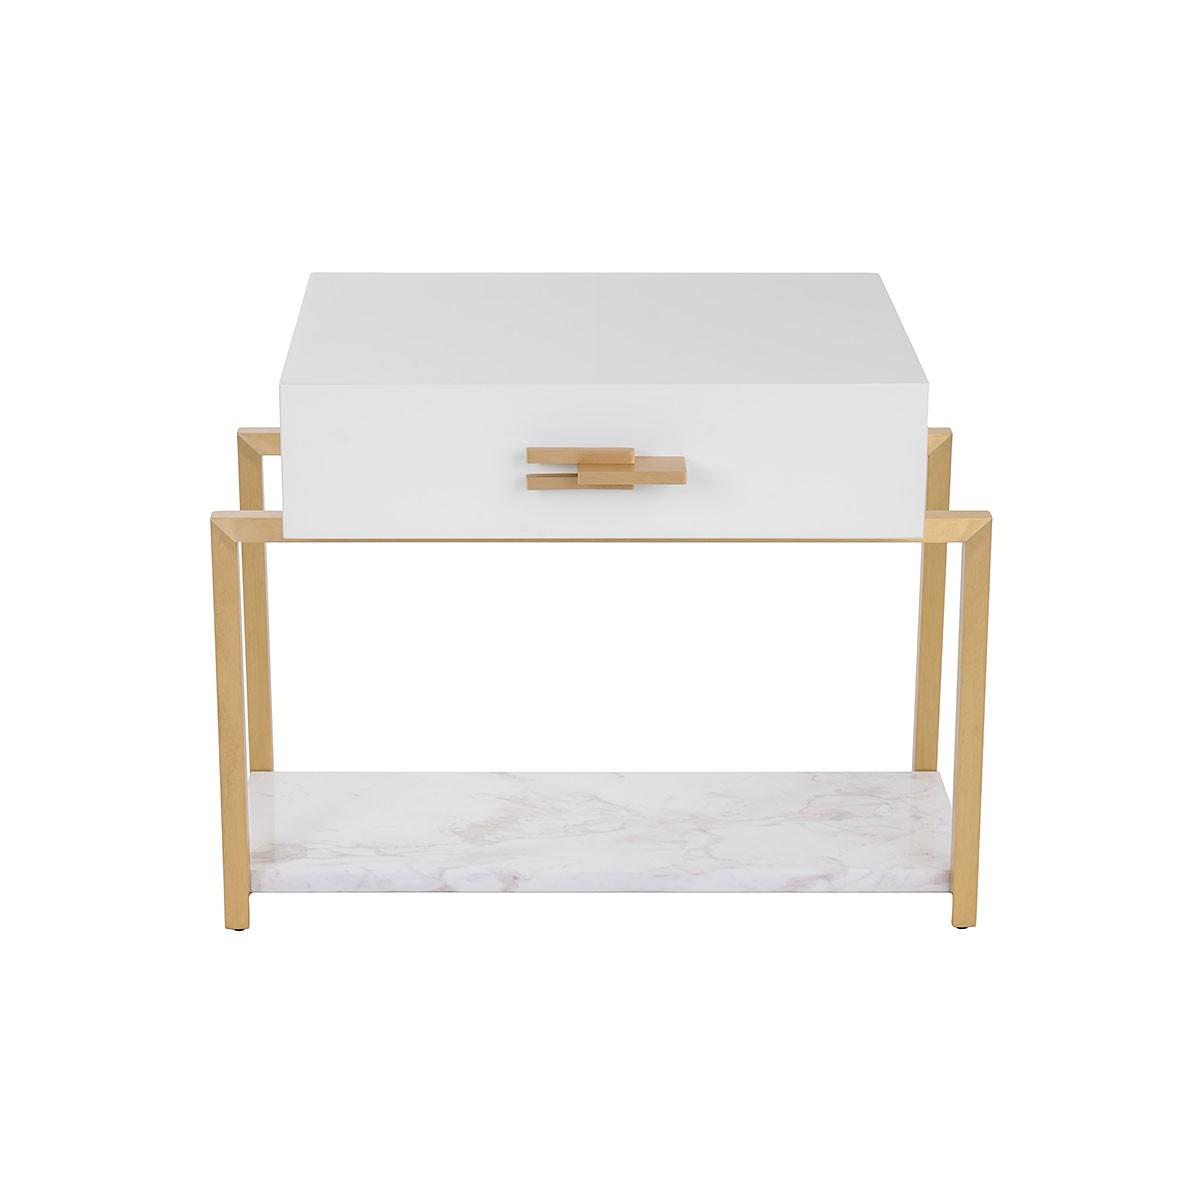 The Naima Bedside Table